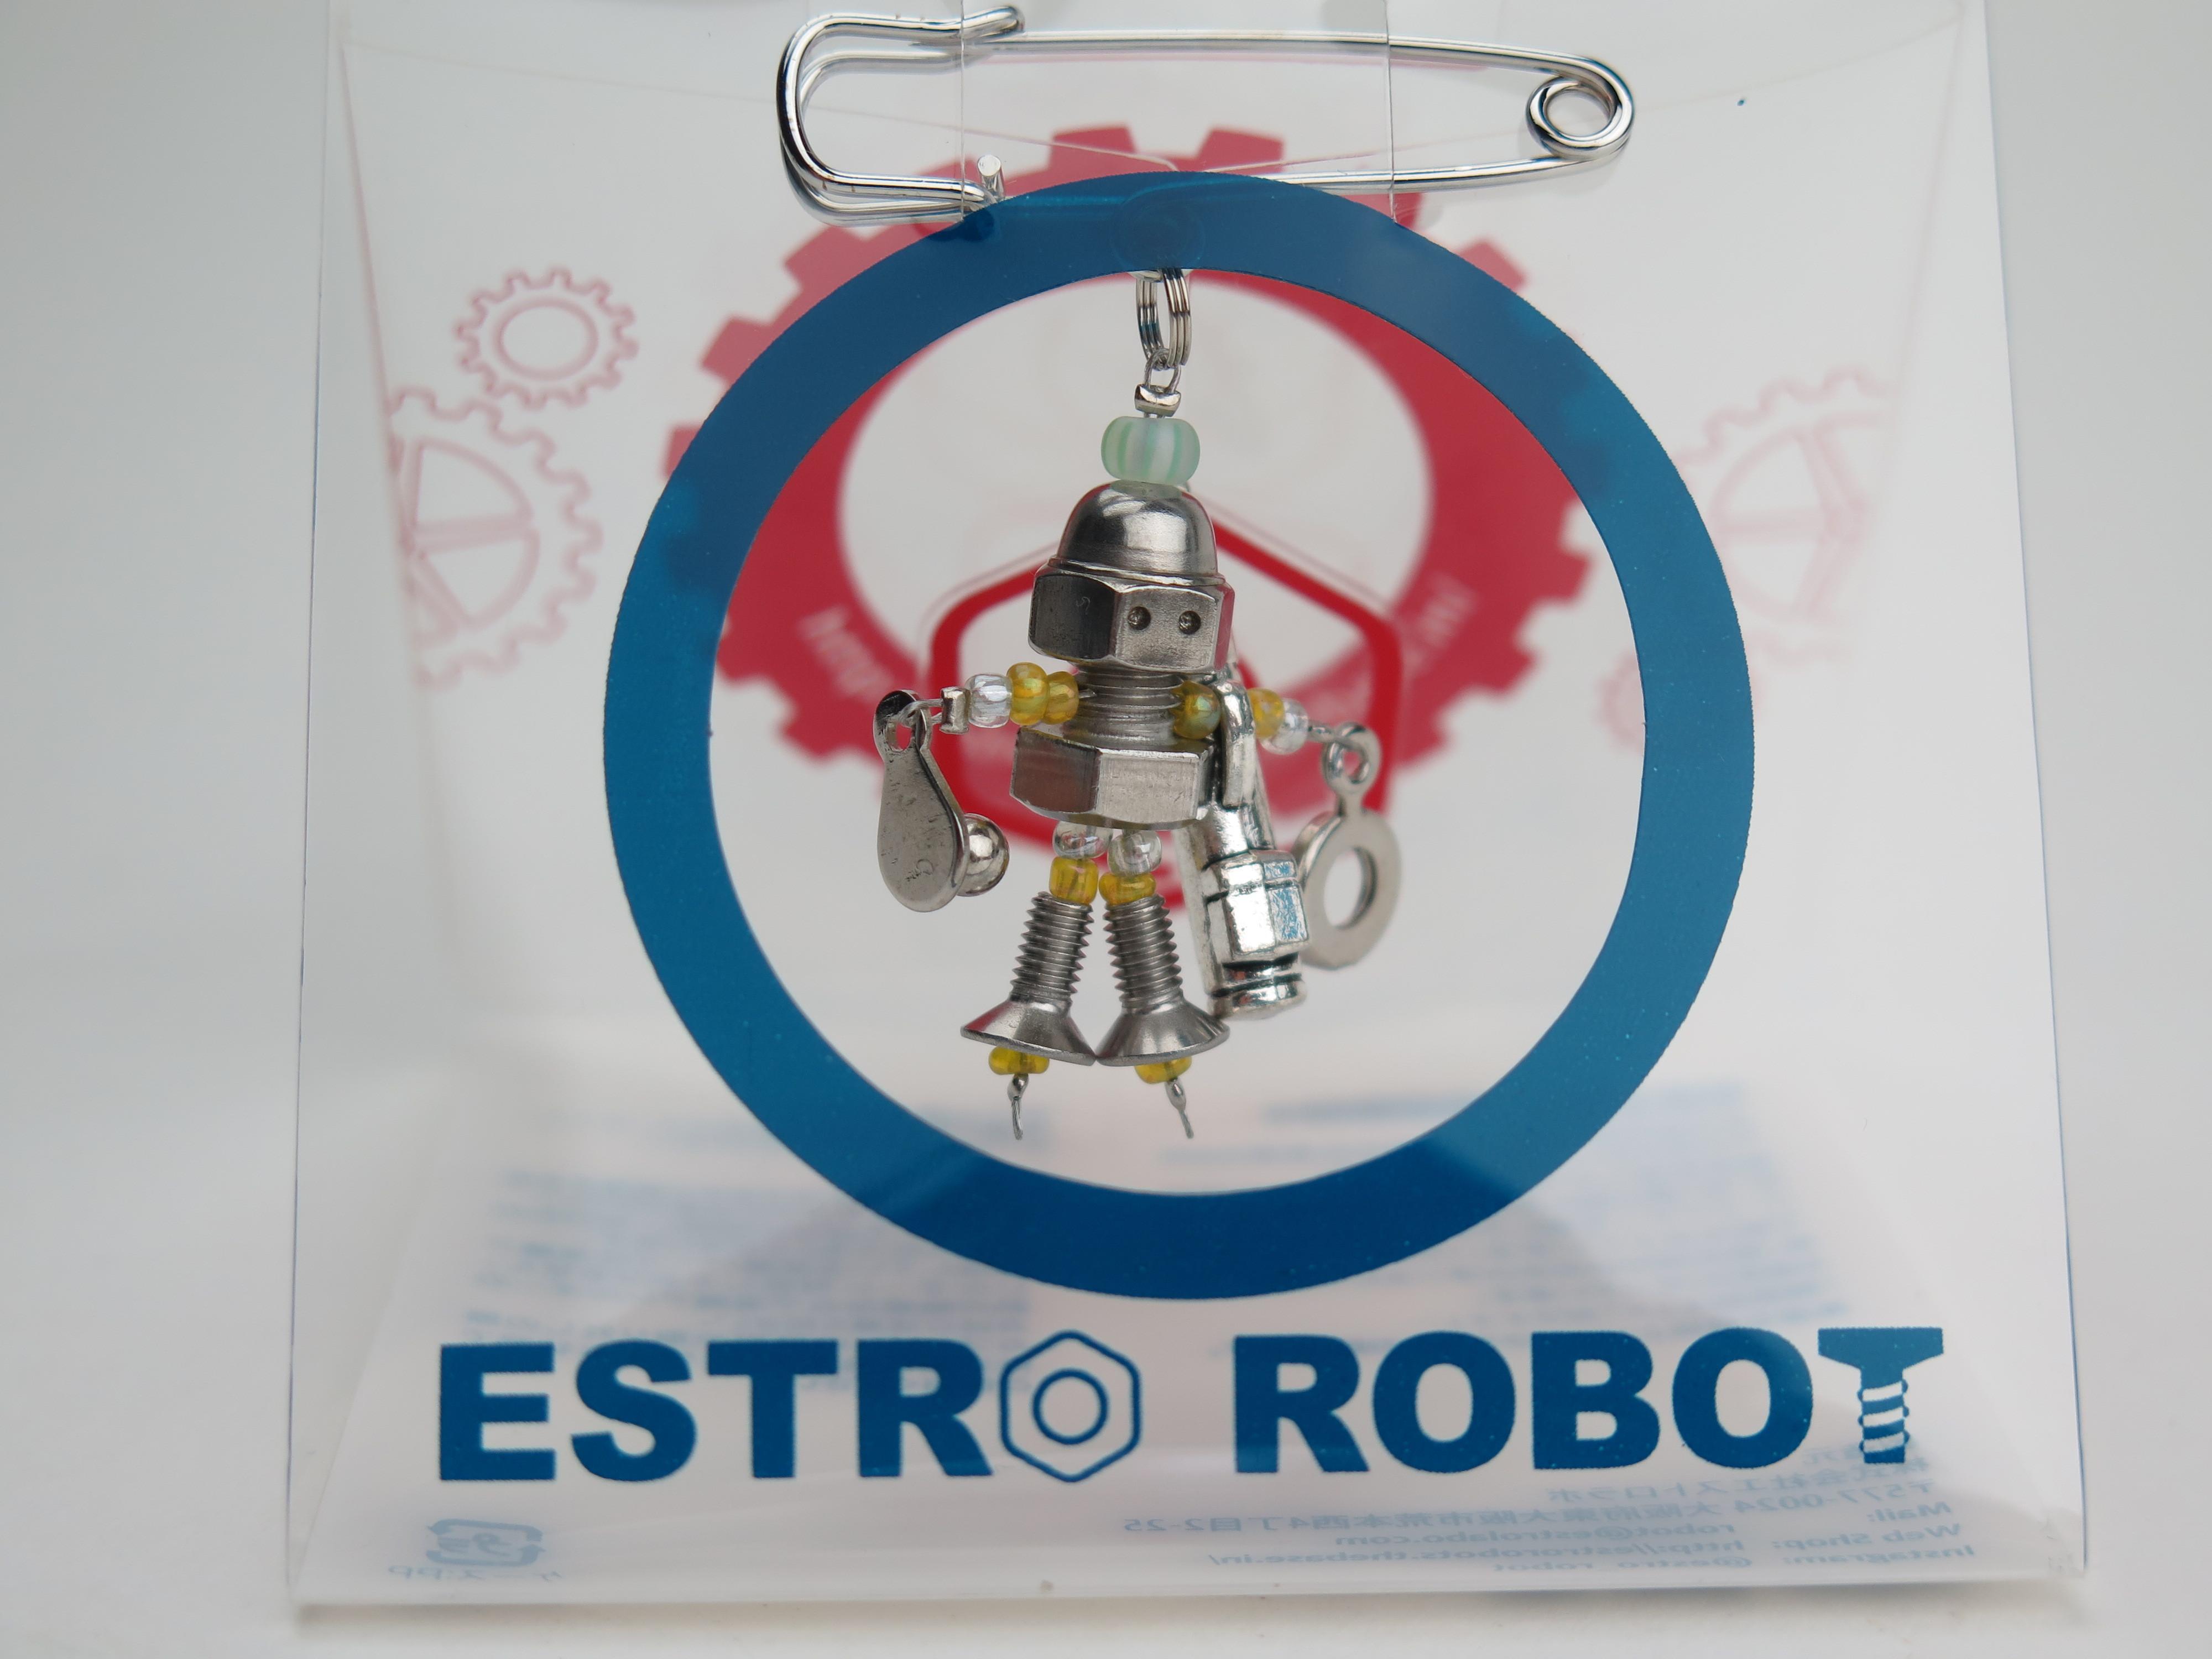 estro robot golf yellow ゴルフ イエロー